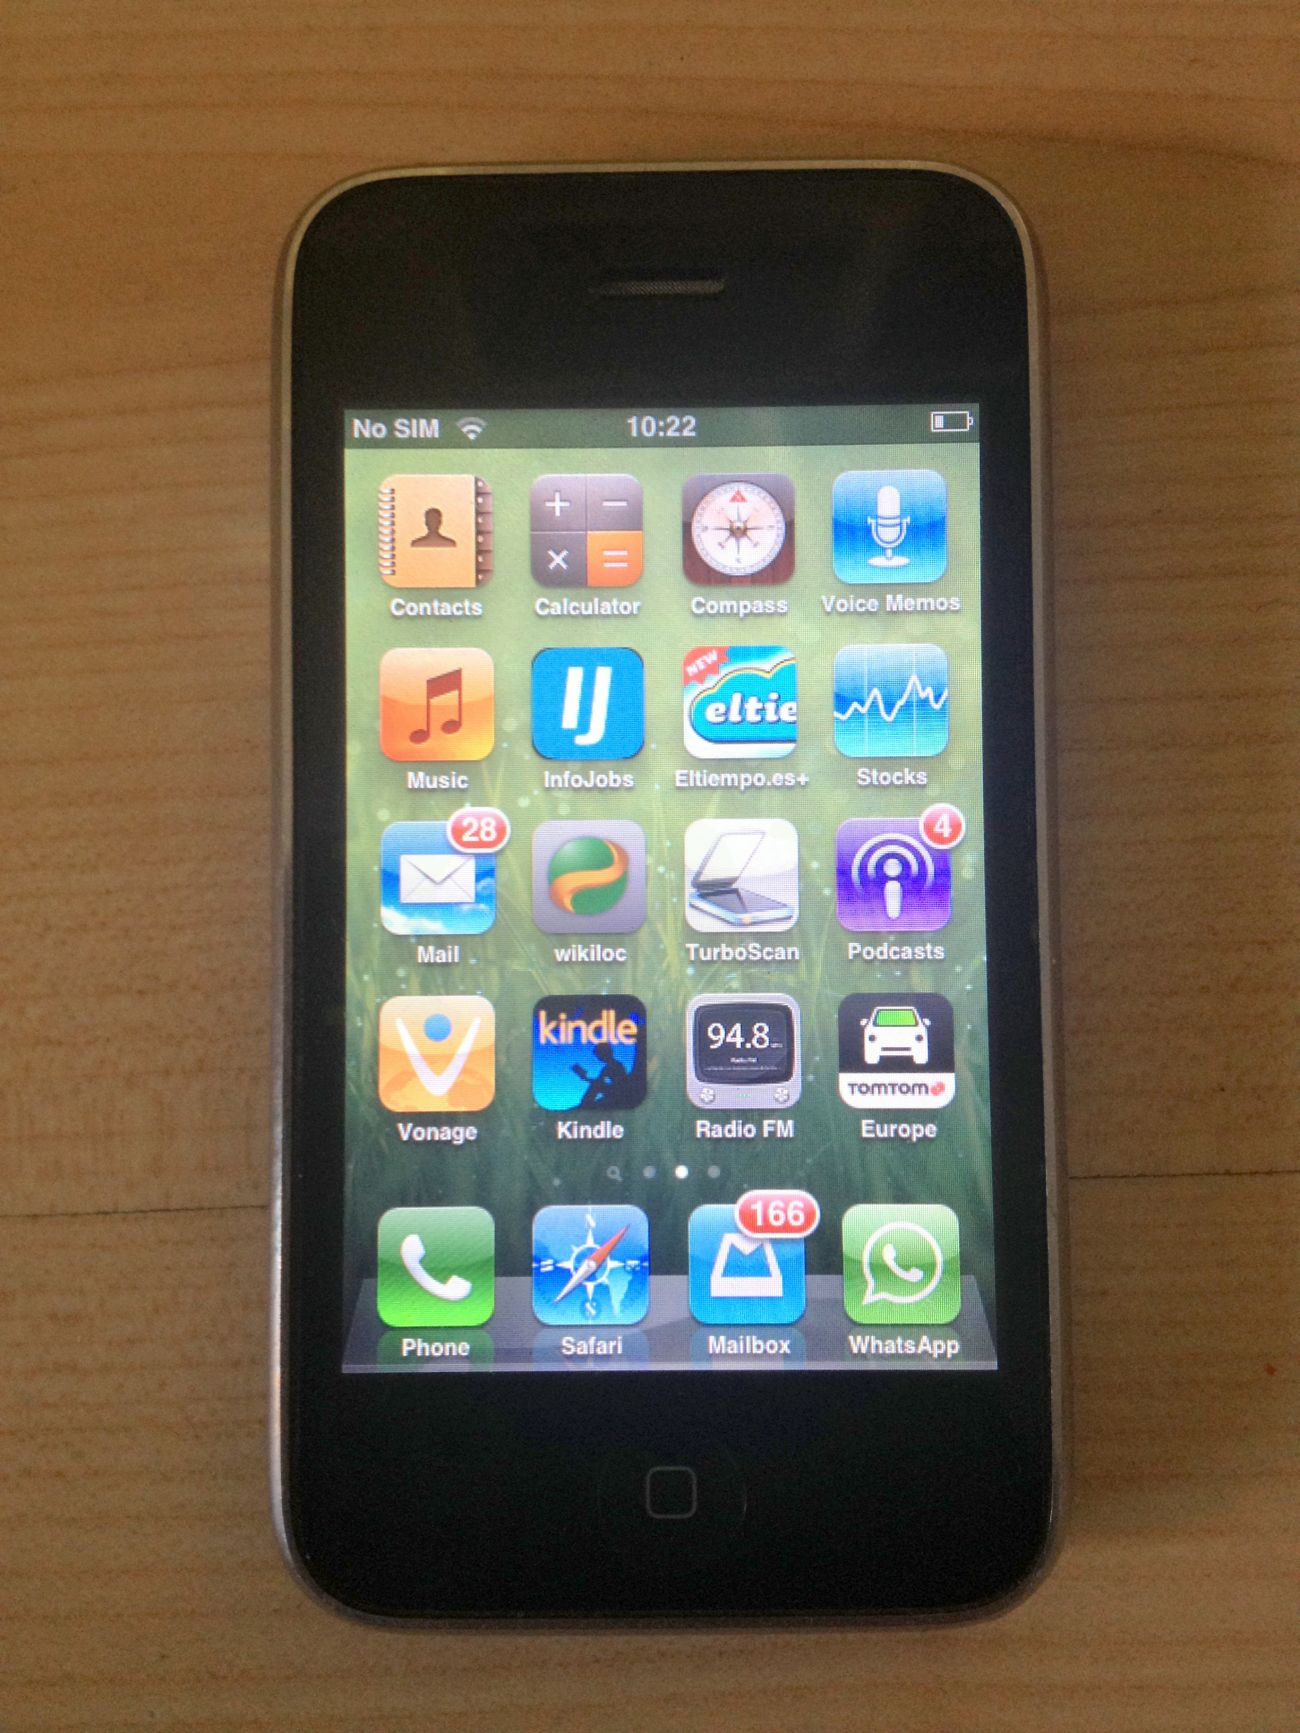 comprar iphone 3gs libre